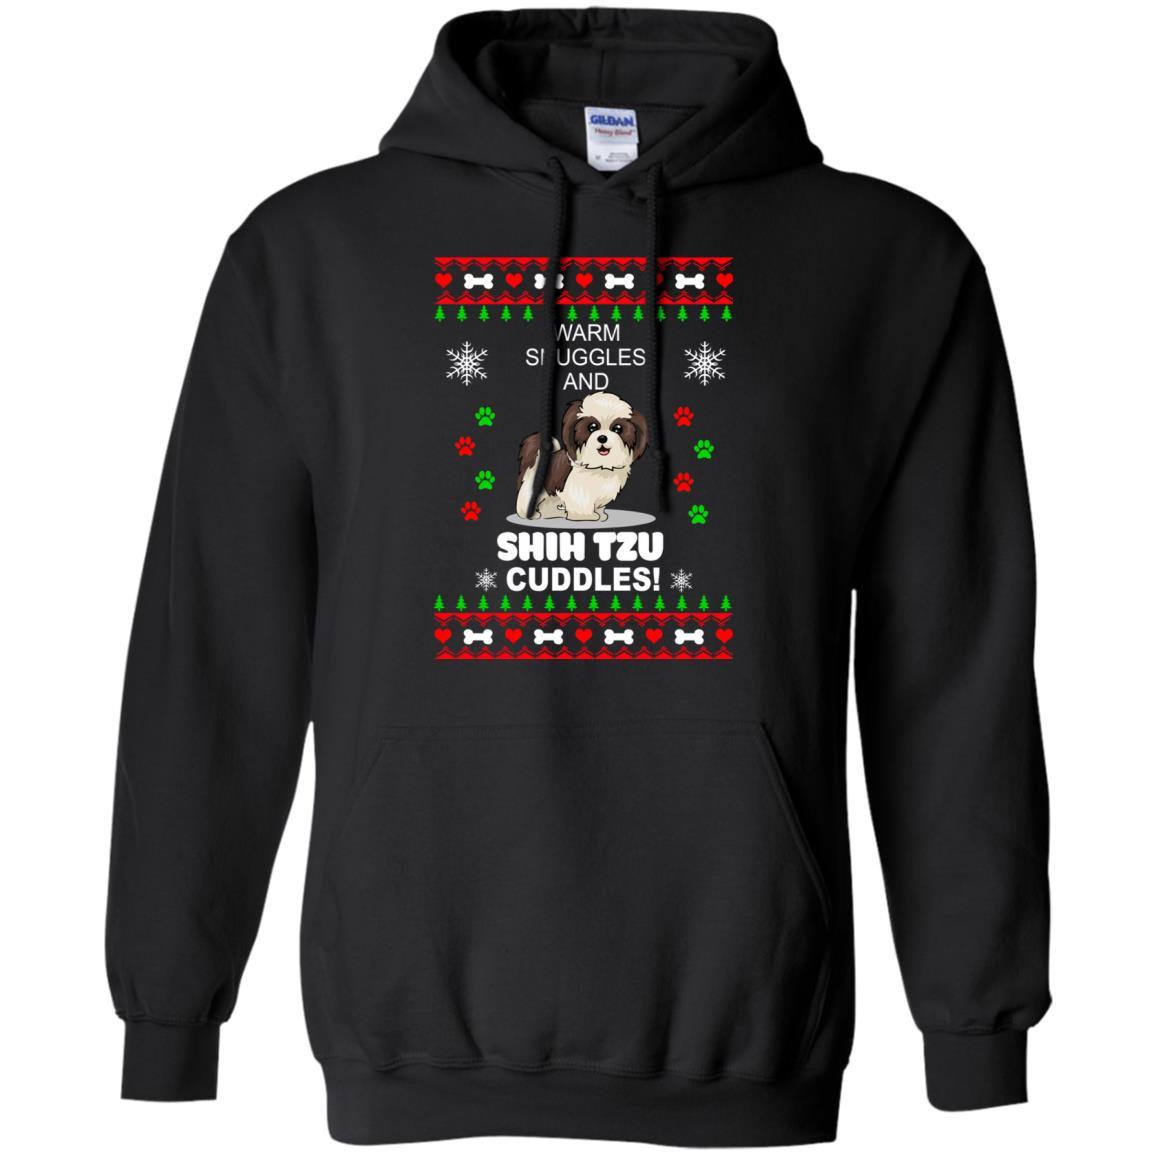 warm snuggles and corgi shih tzu christmas sweater shirt image 4181 510x510